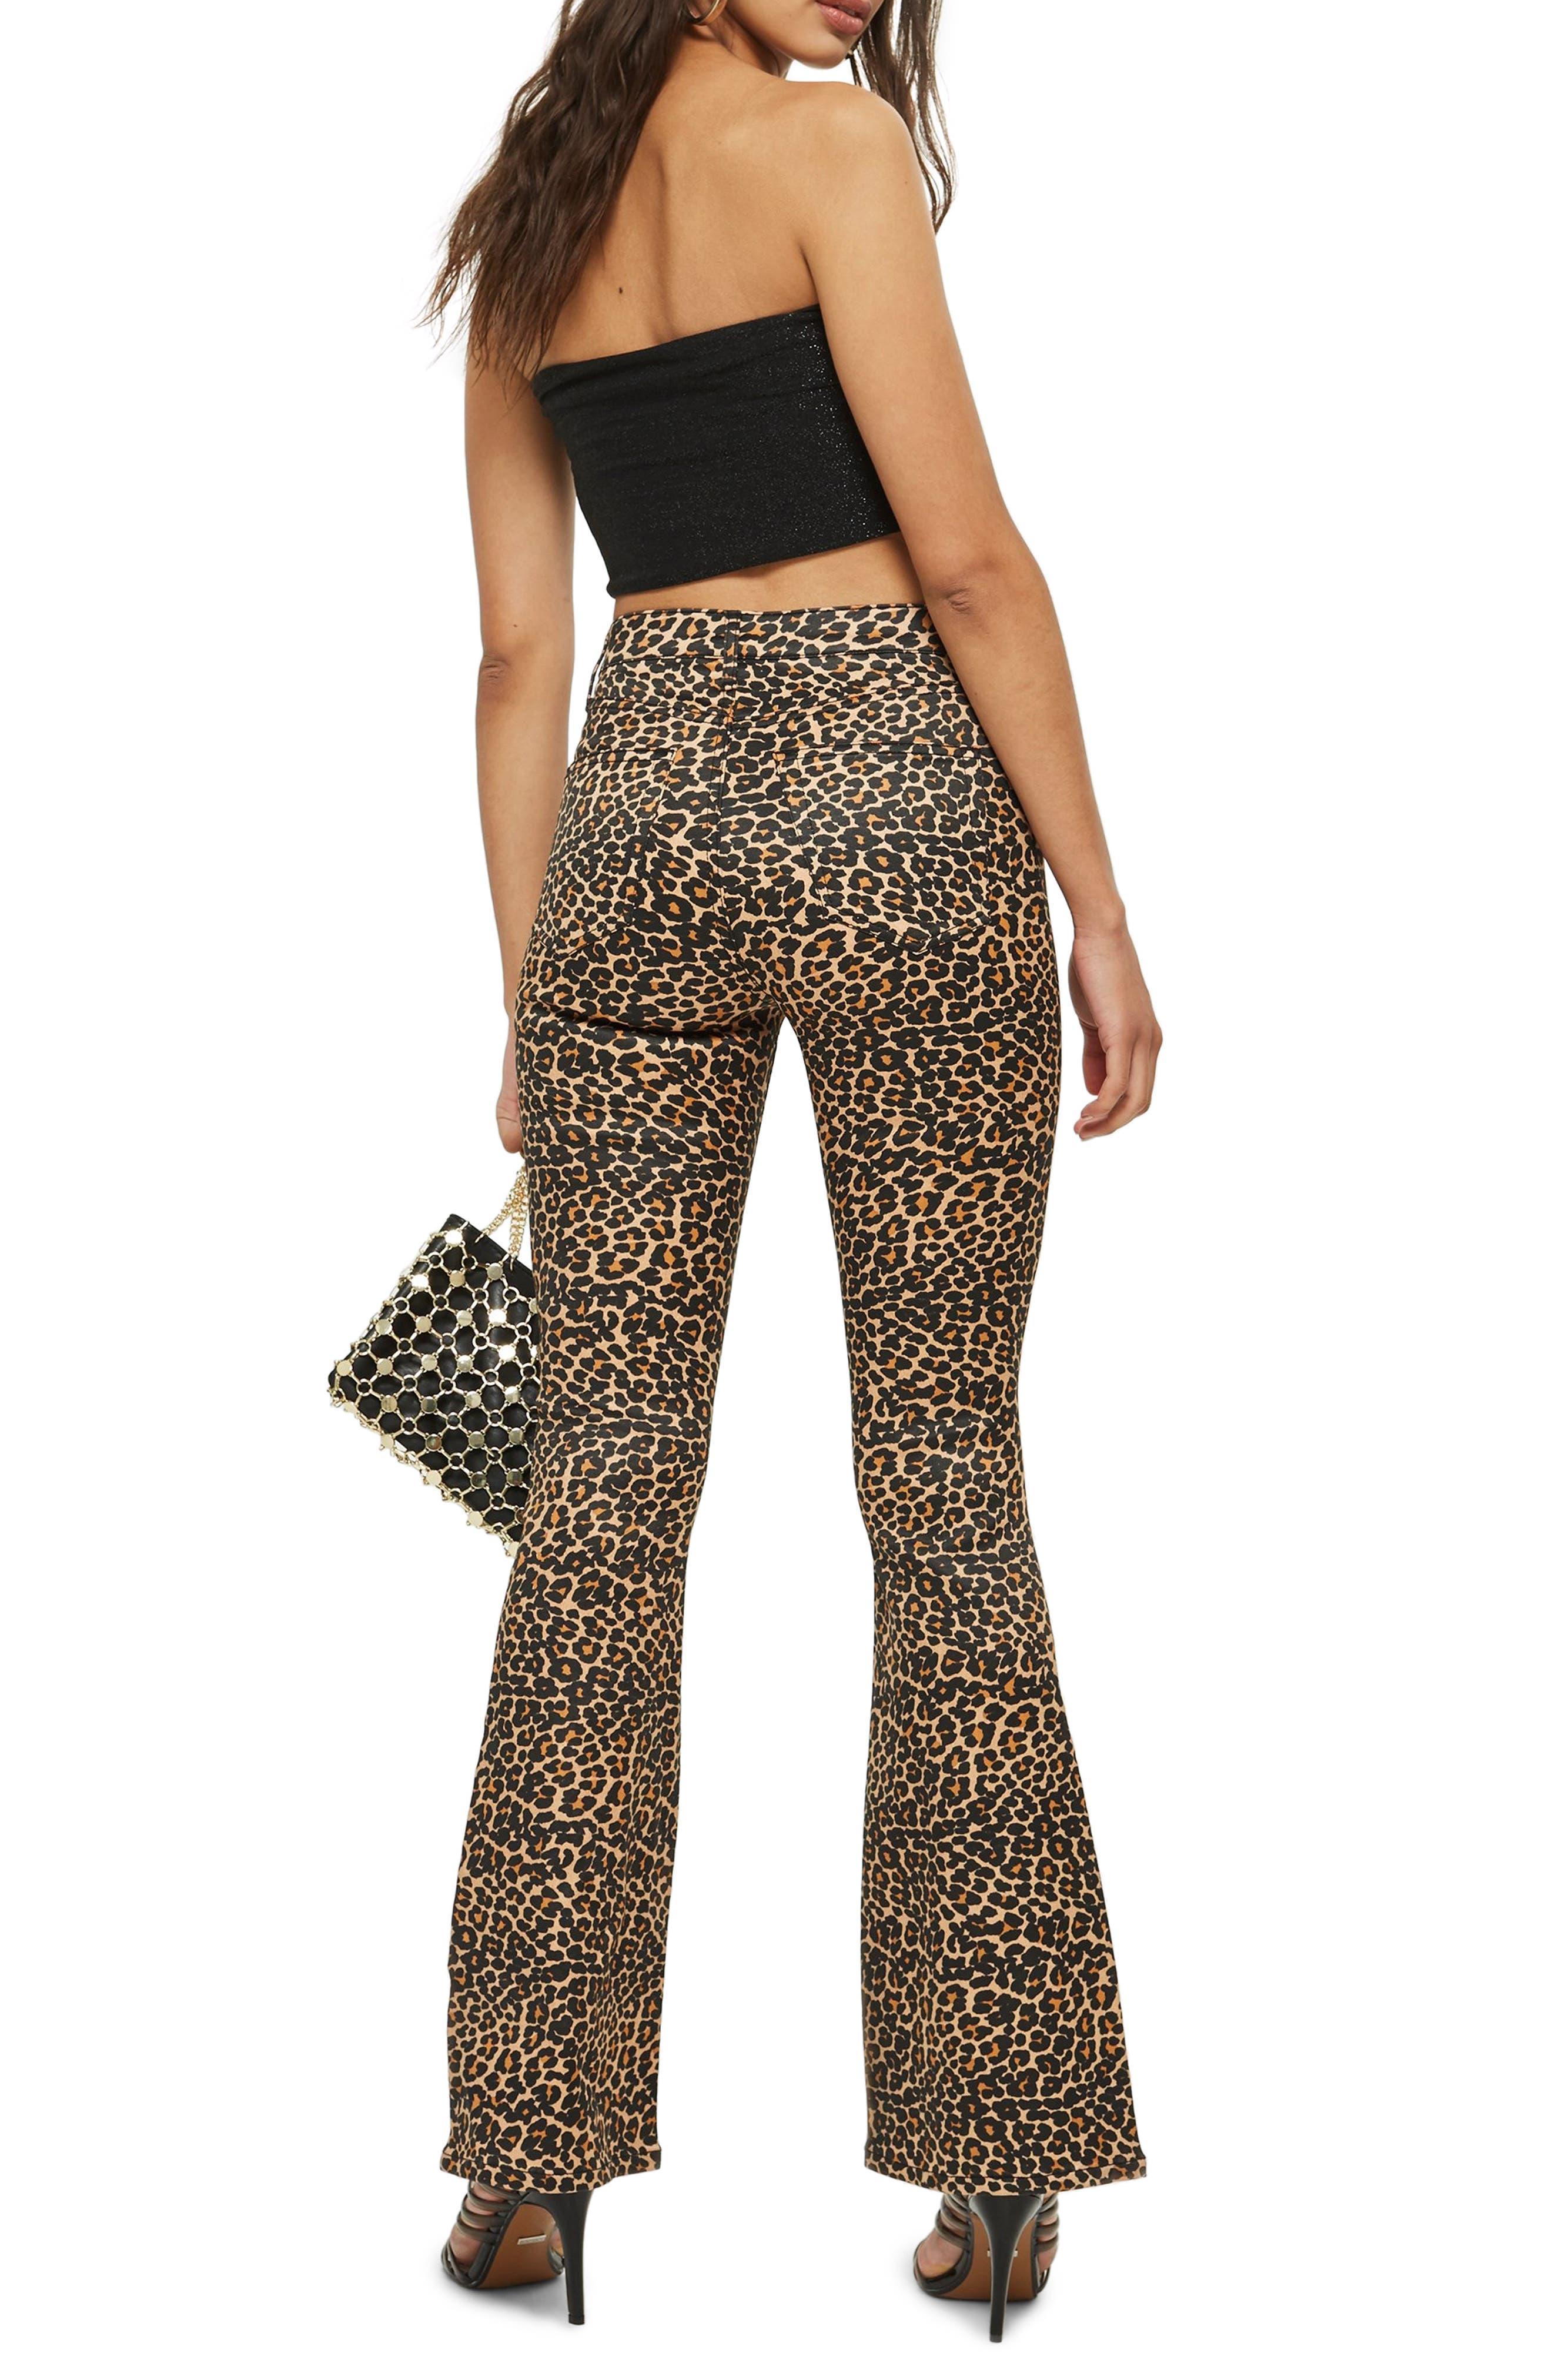 TOPSHOP, MOTO Leopard Print Flare Jeans, Alternate thumbnail 2, color, 200